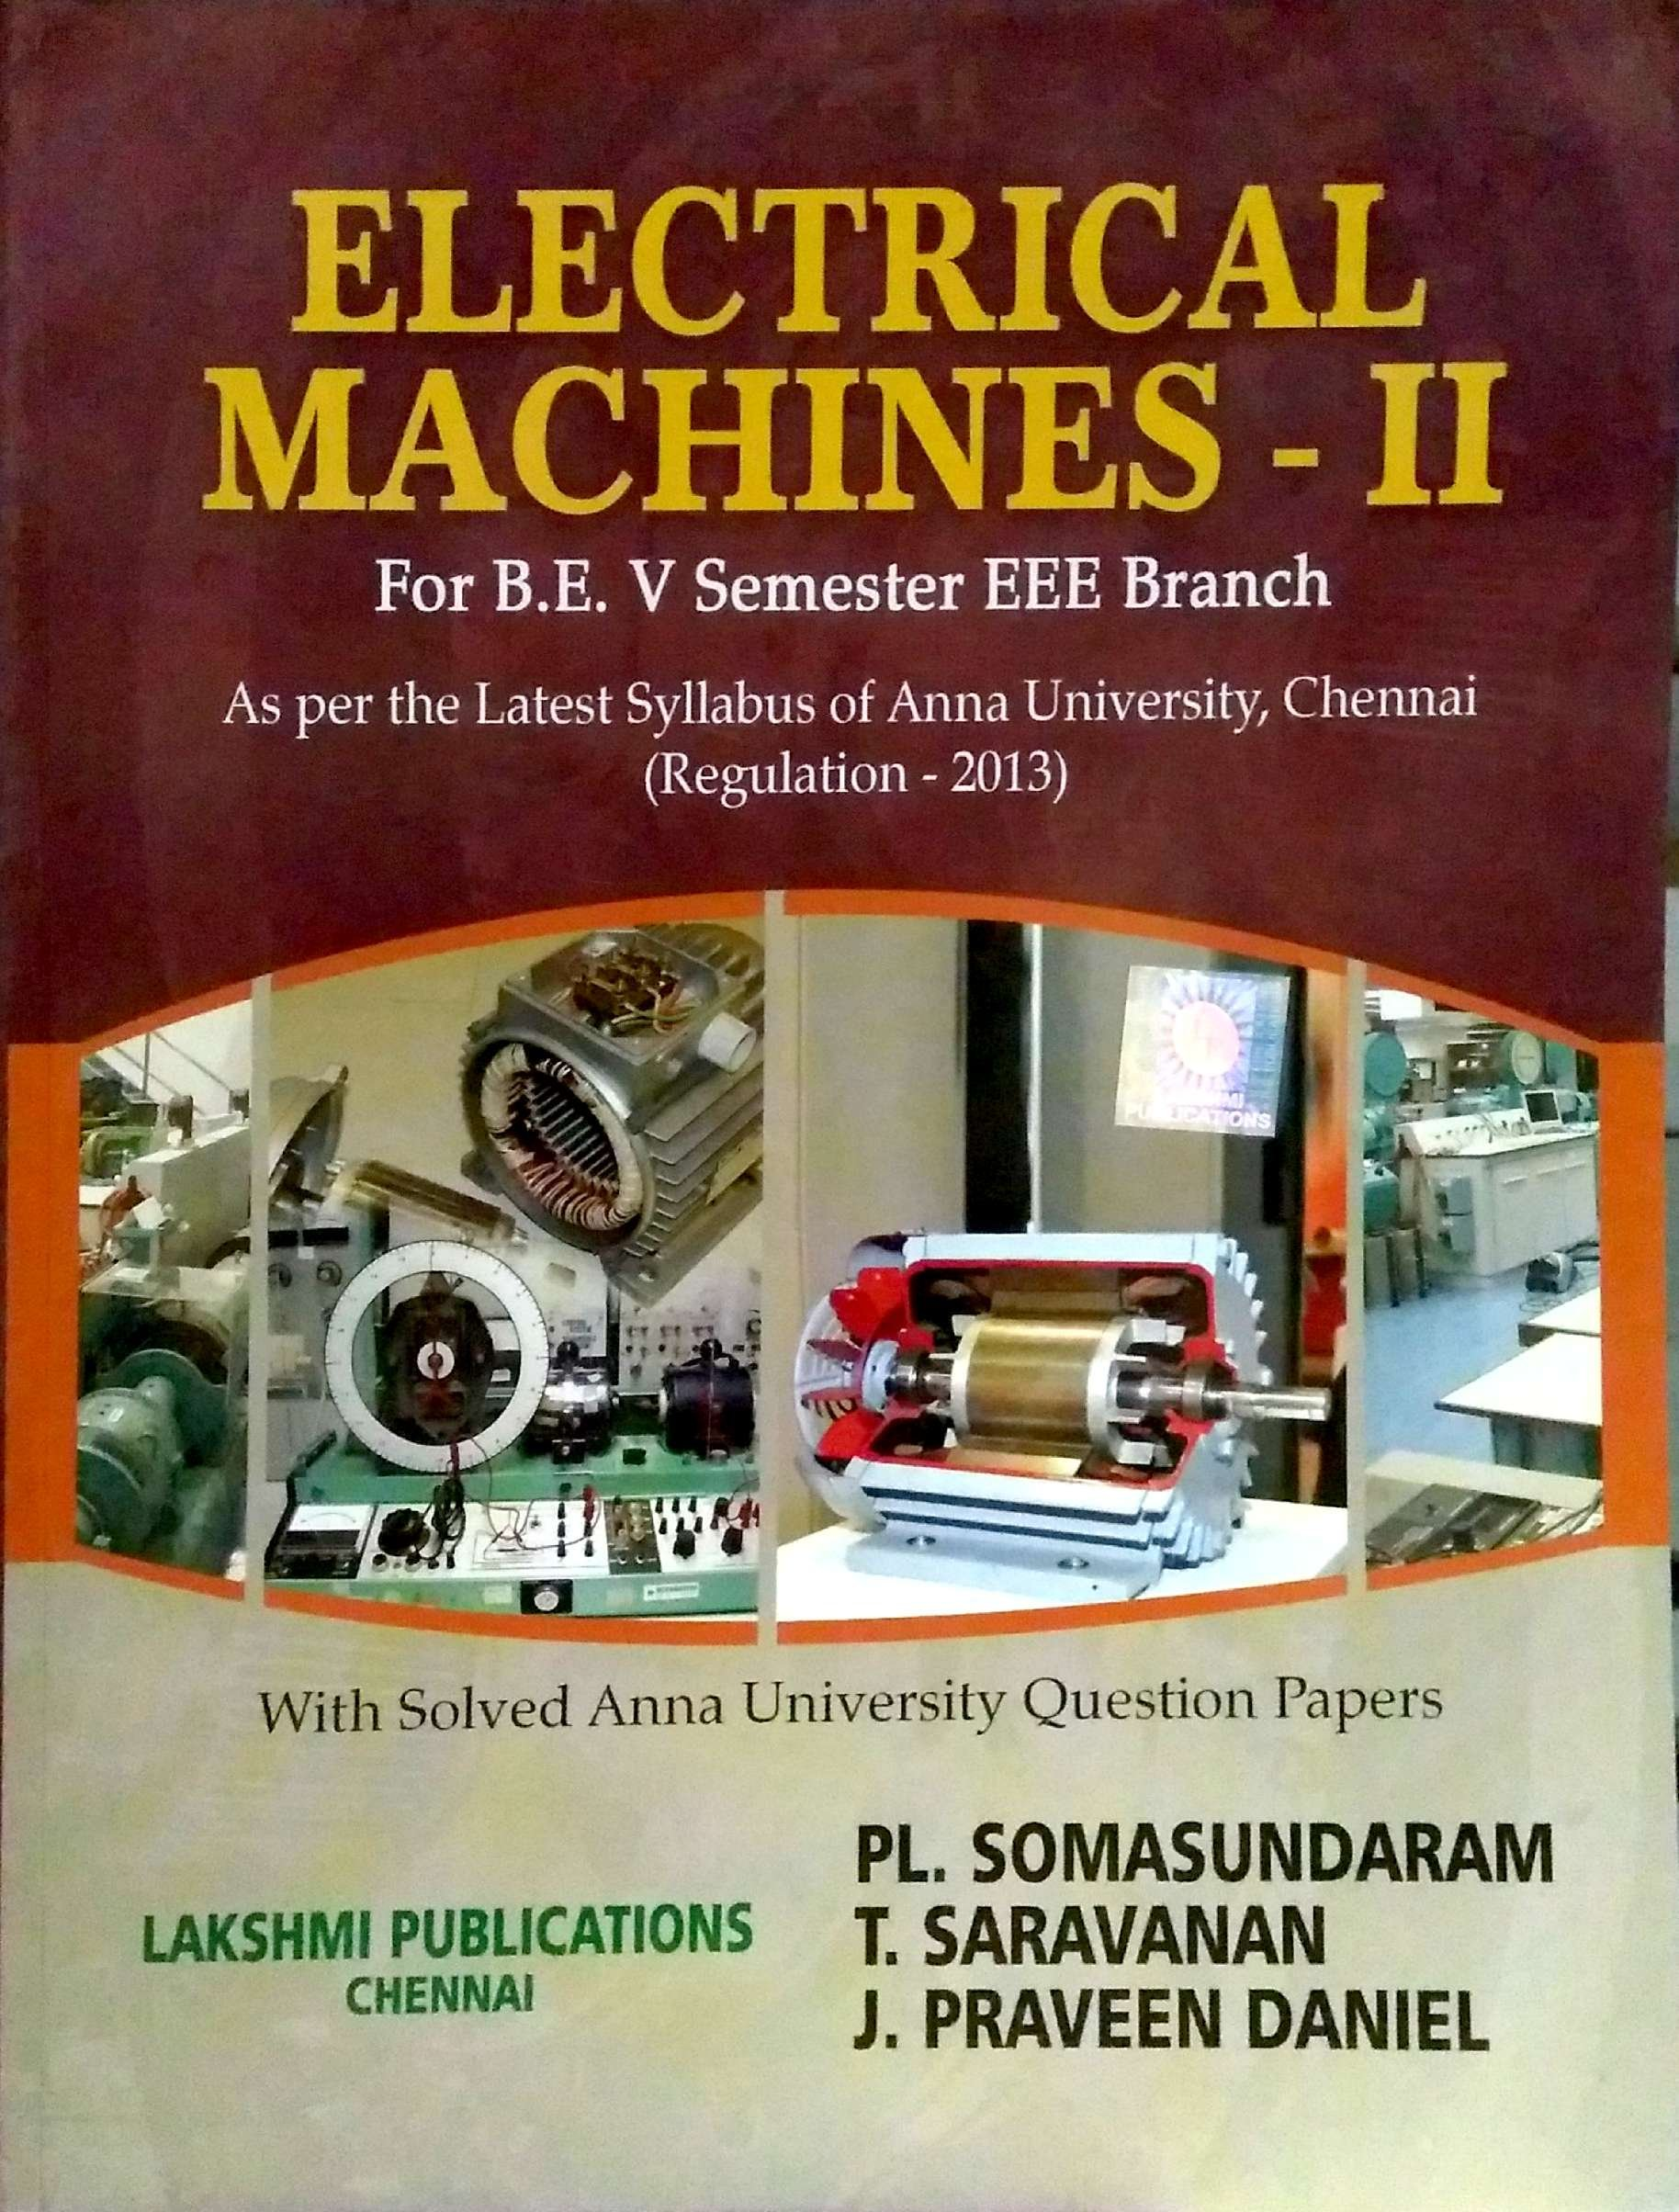 EE6504 Electrical Machines-II